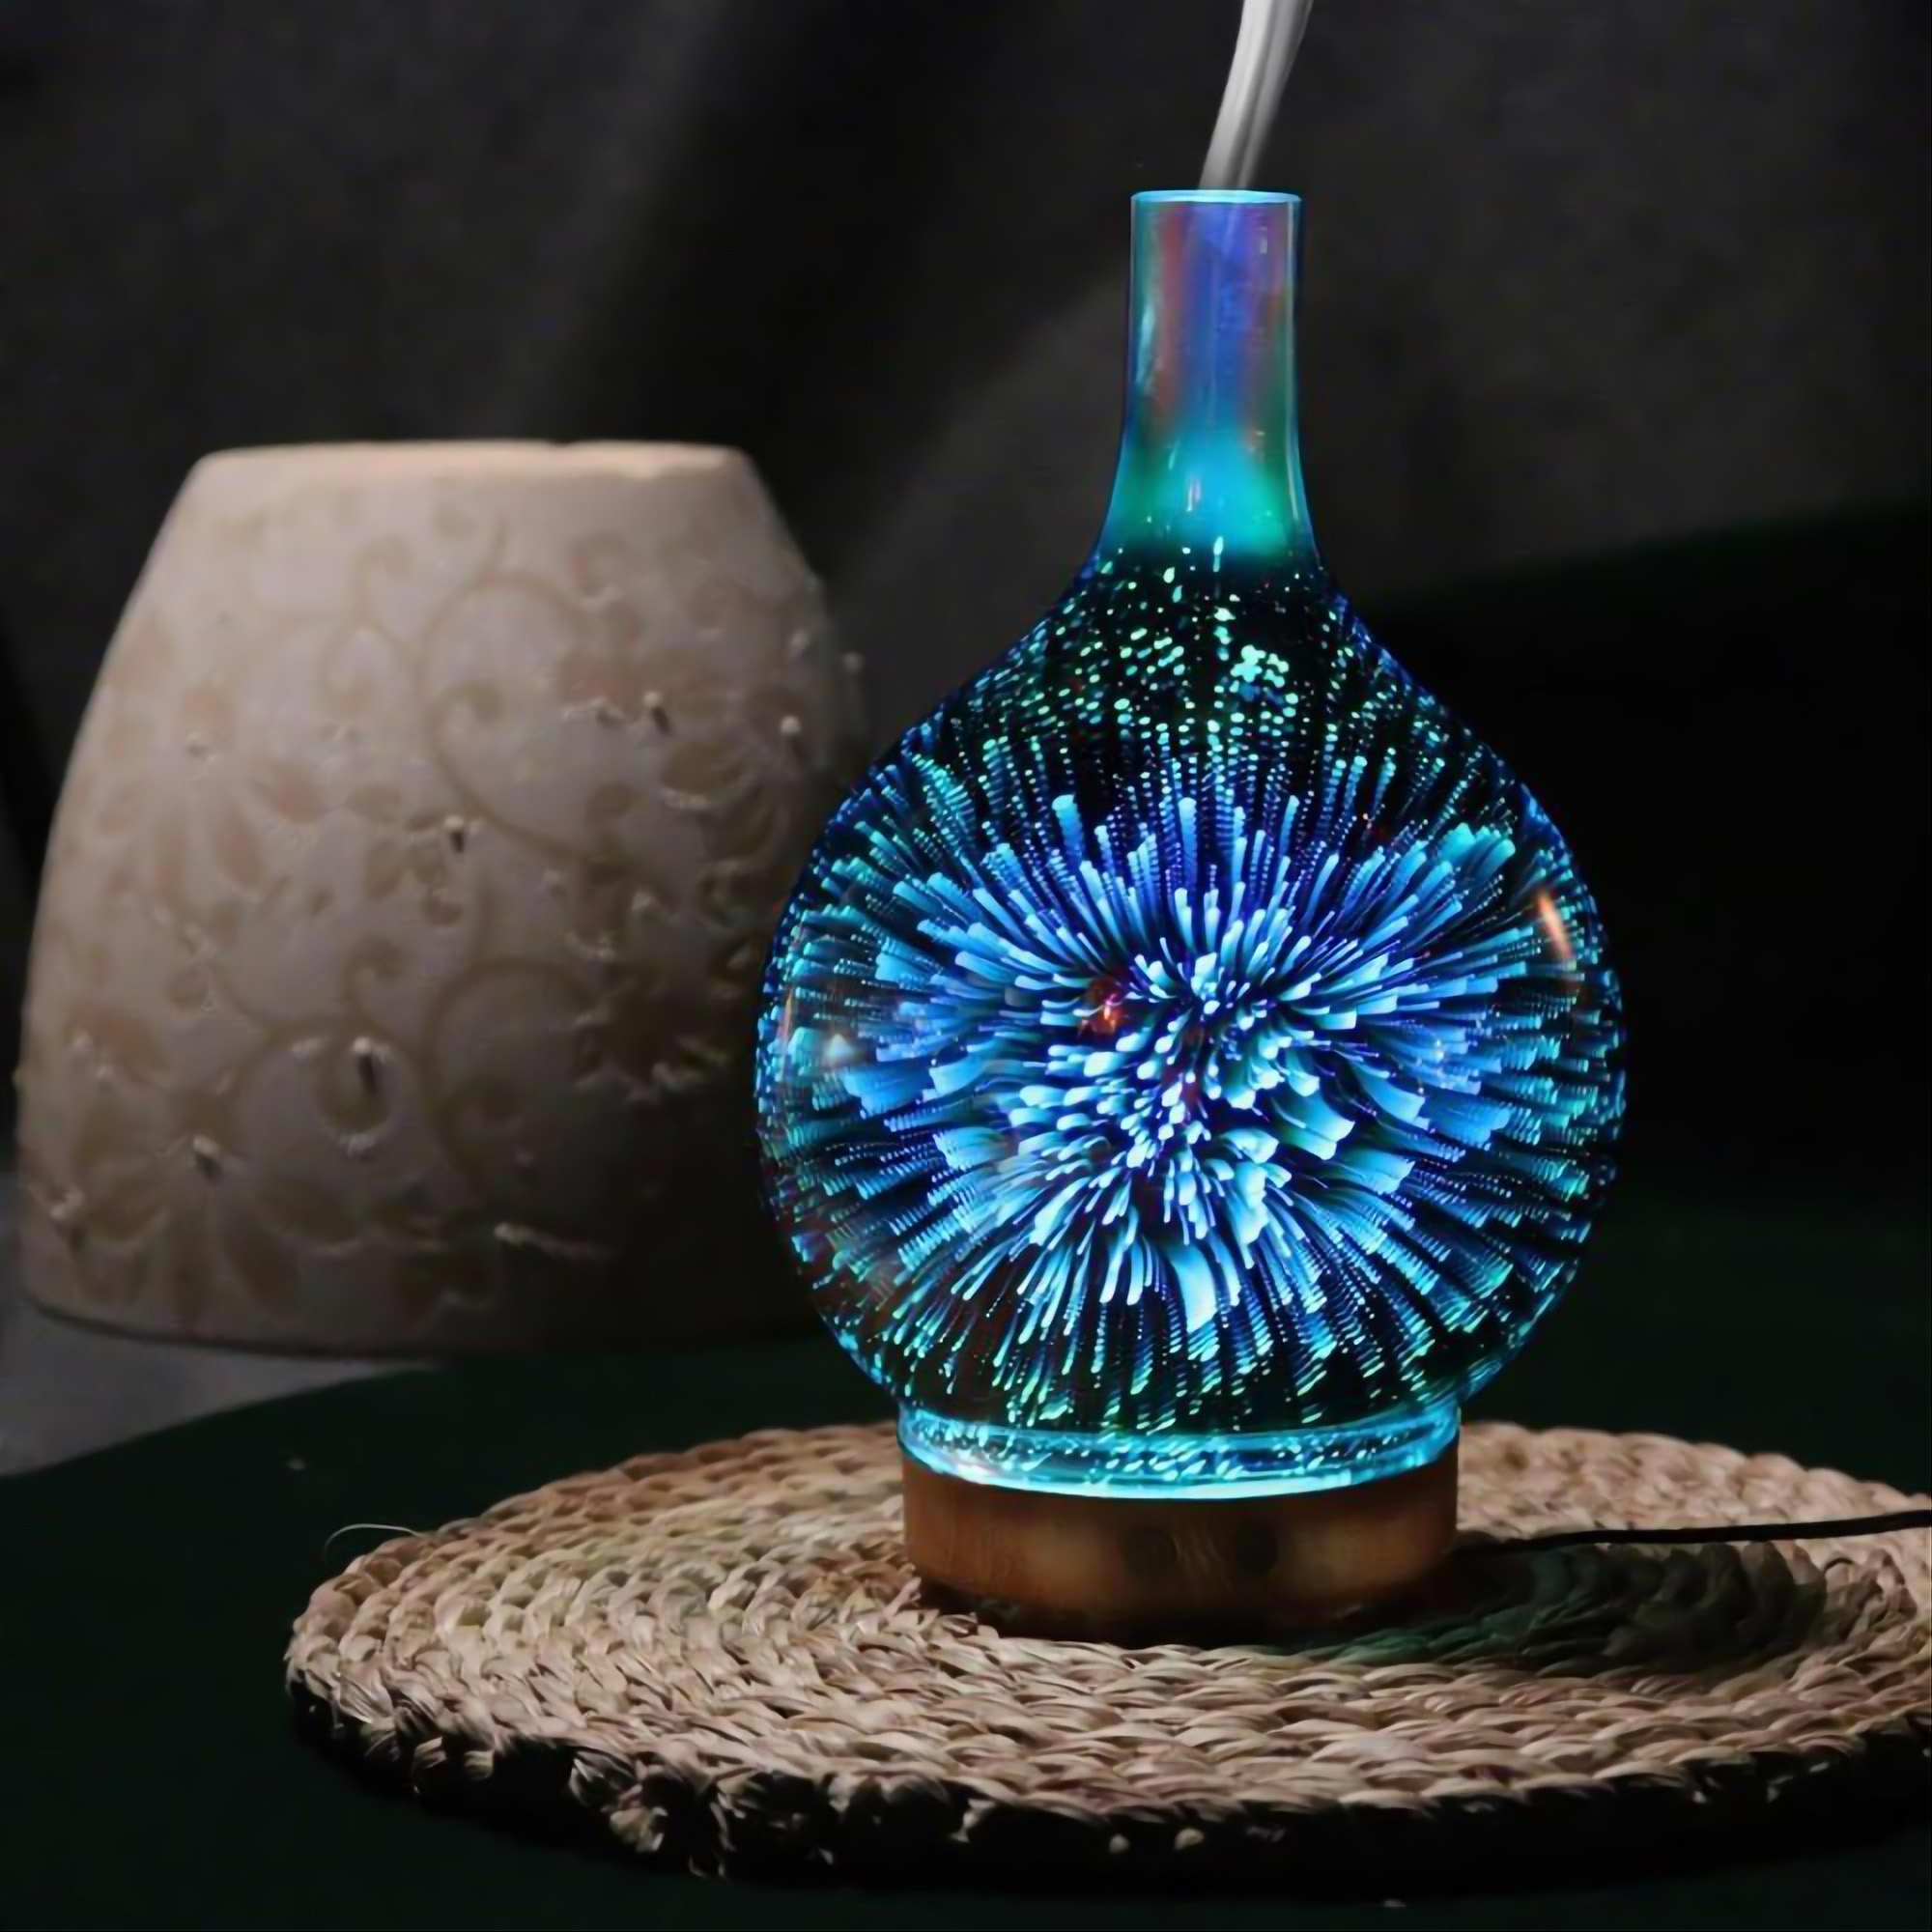 upscaler-inspire-uplift-stardust-oil-diffuser-light-wood-stardust-oil-diffuser-13872696787043_1024x1024@2x-2x.jpg